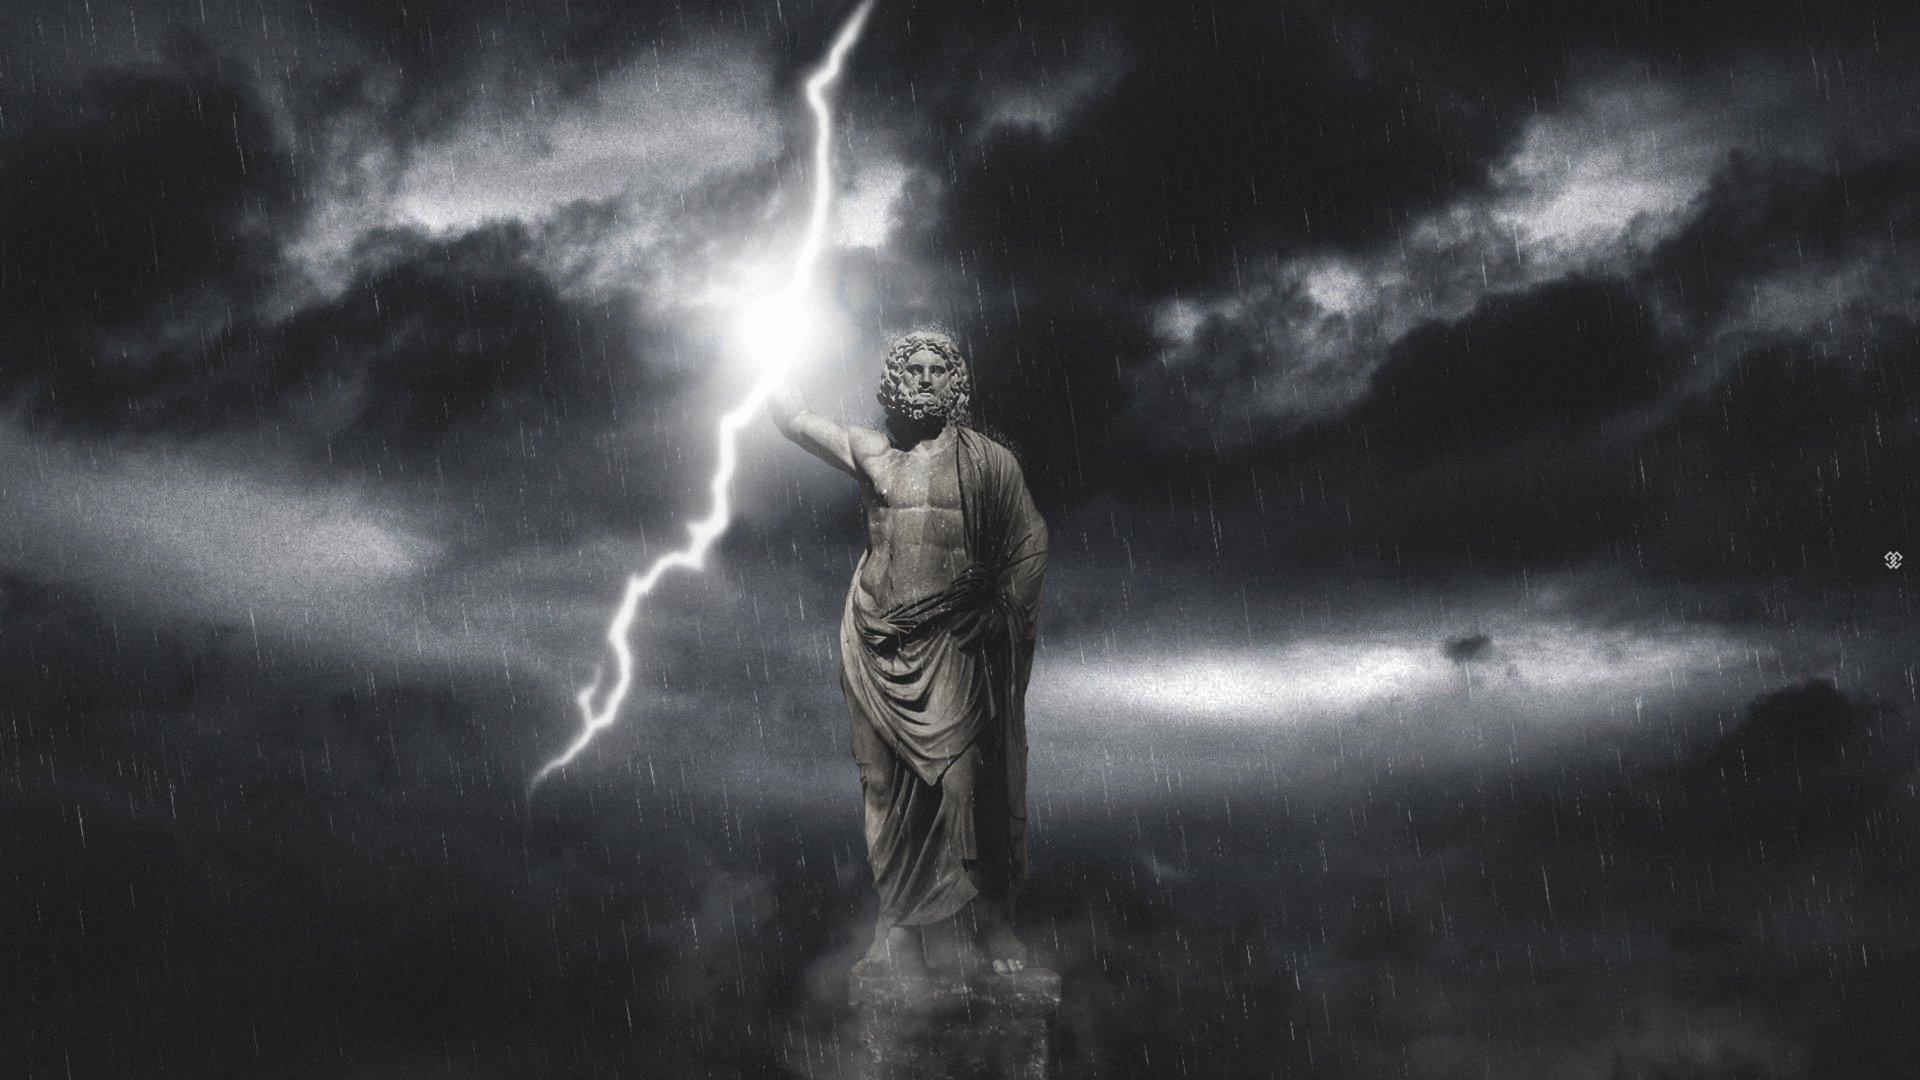 storm weather rain sky clouds nature lightning gods god